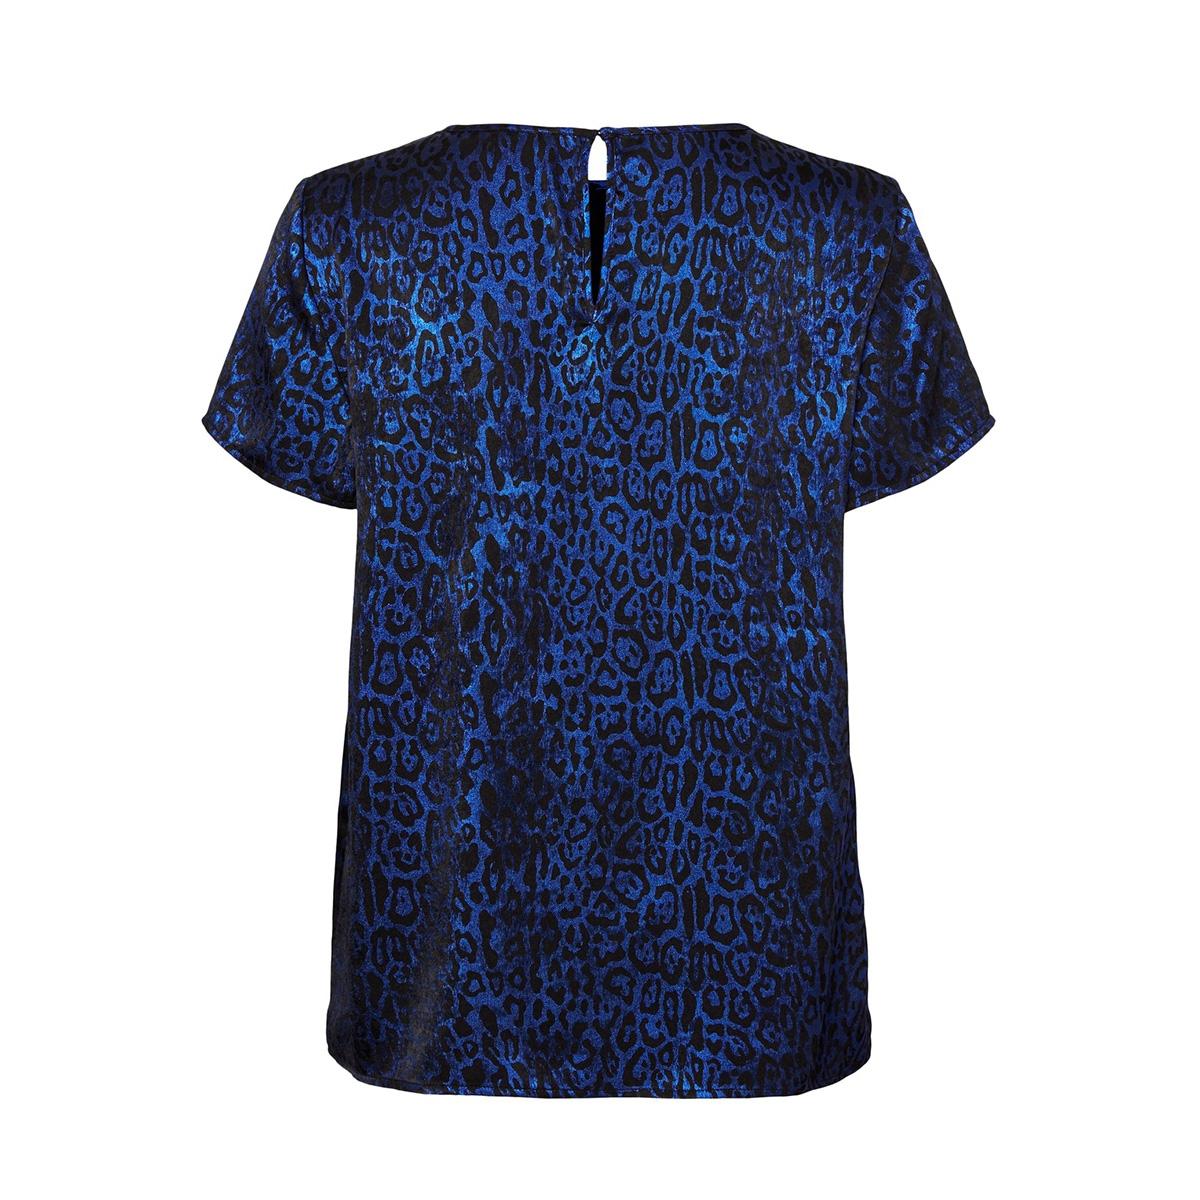 vmdakota s/s top wvn lcs 10227181 vero moda t-shirt black/sodalite b